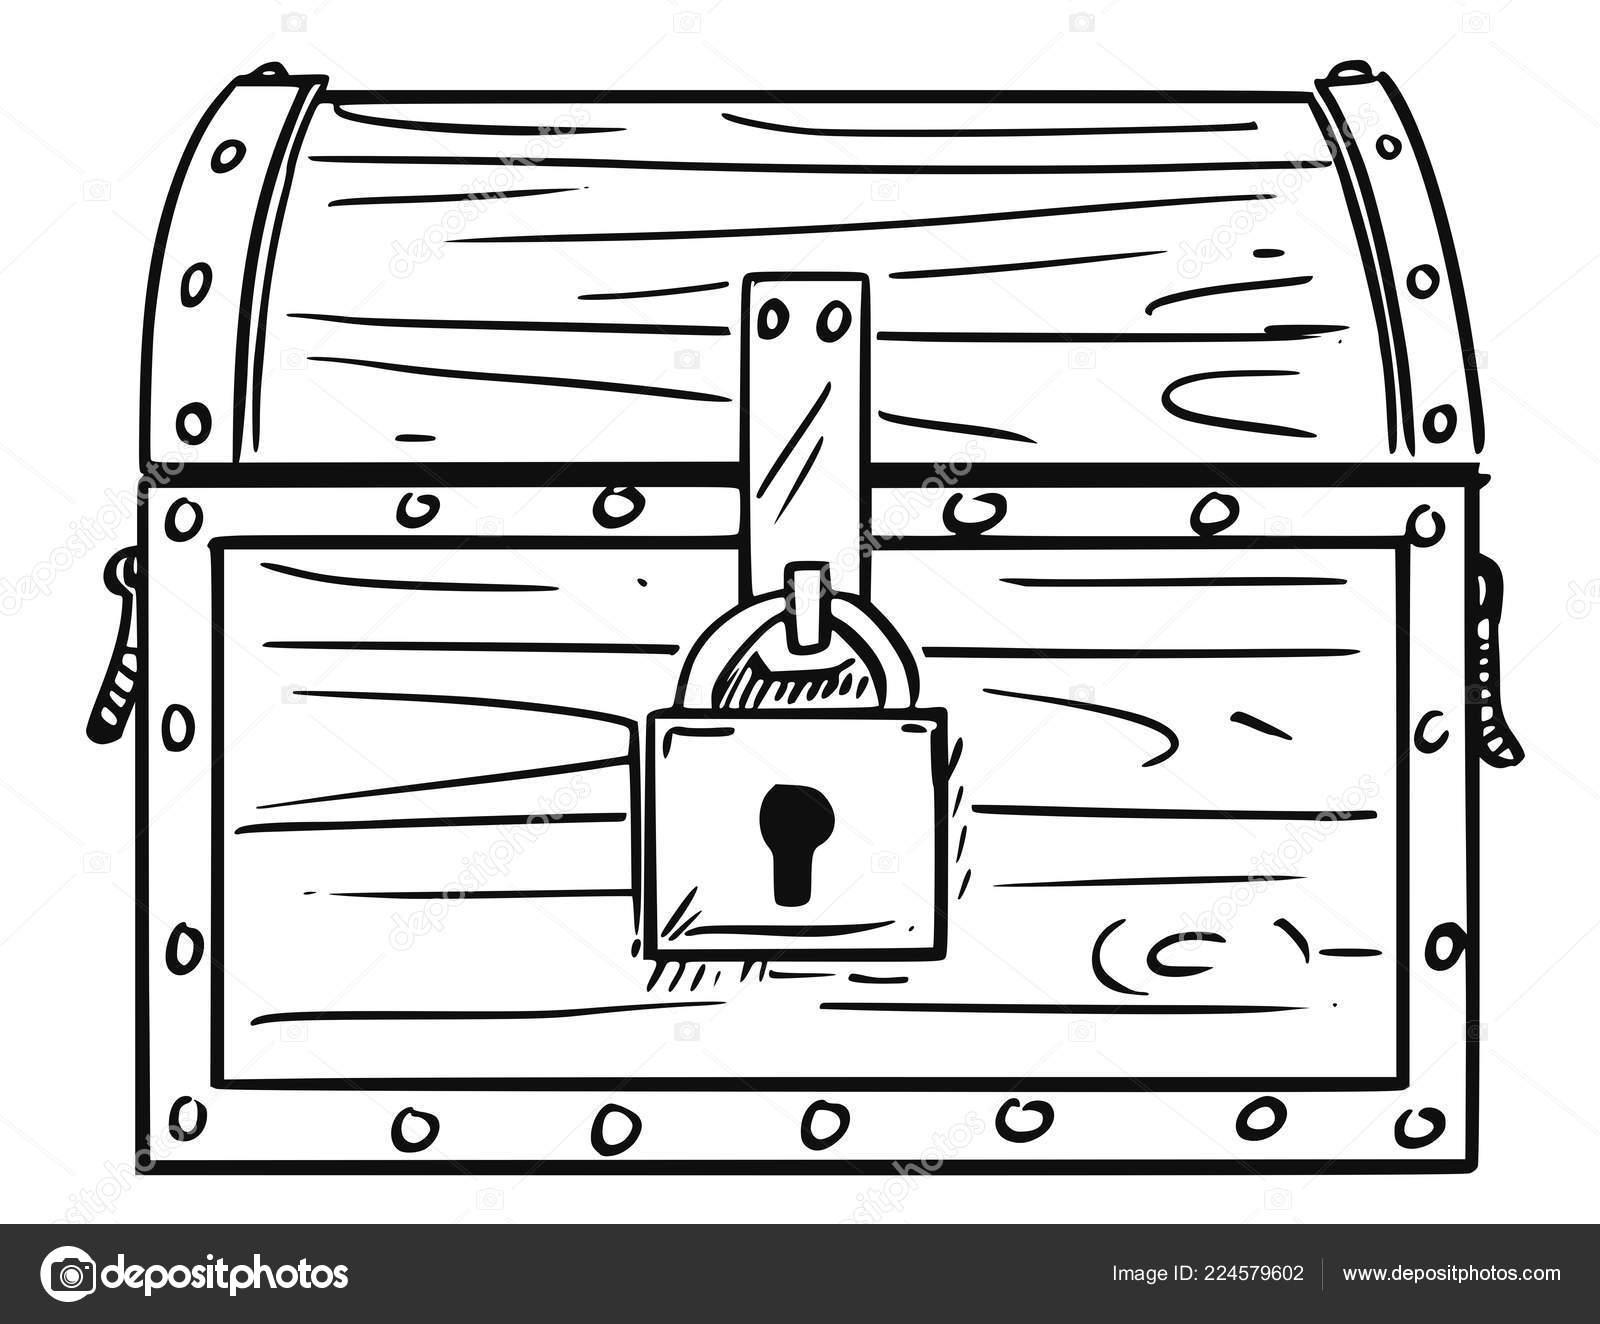 How To Draw A Treasure Box Cartoon Drawing Of Locked Antique Wooden Treasure Chest Box Stock Vector C Ursus Zdeneksasek Com 224579602